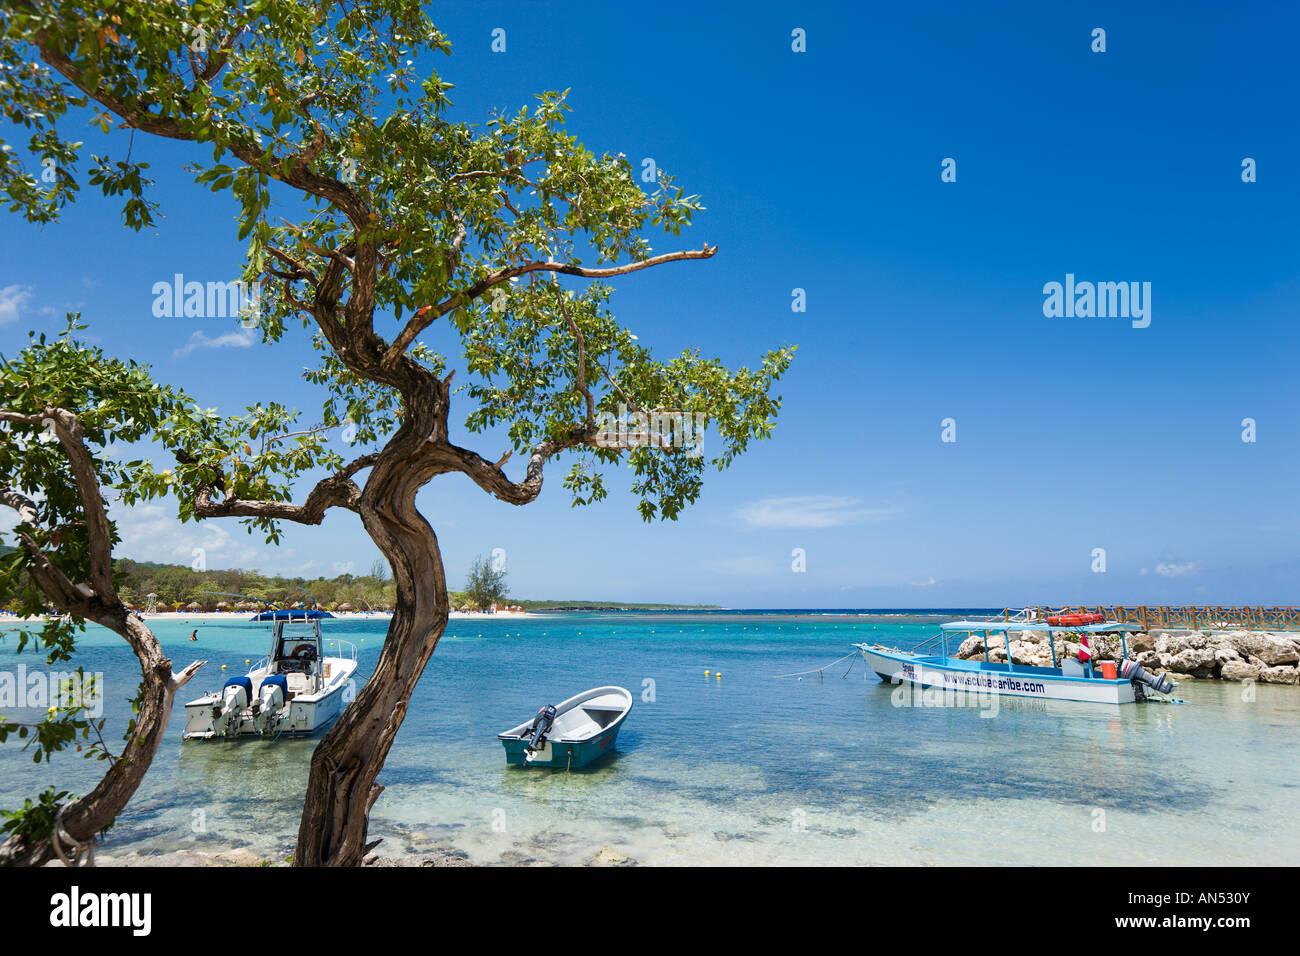 Spiaggia a Gran Bahia Principe Resort, Runaway Bay, a nord della costa, in Giamaica, Caraibi, West Indies Immagini Stock